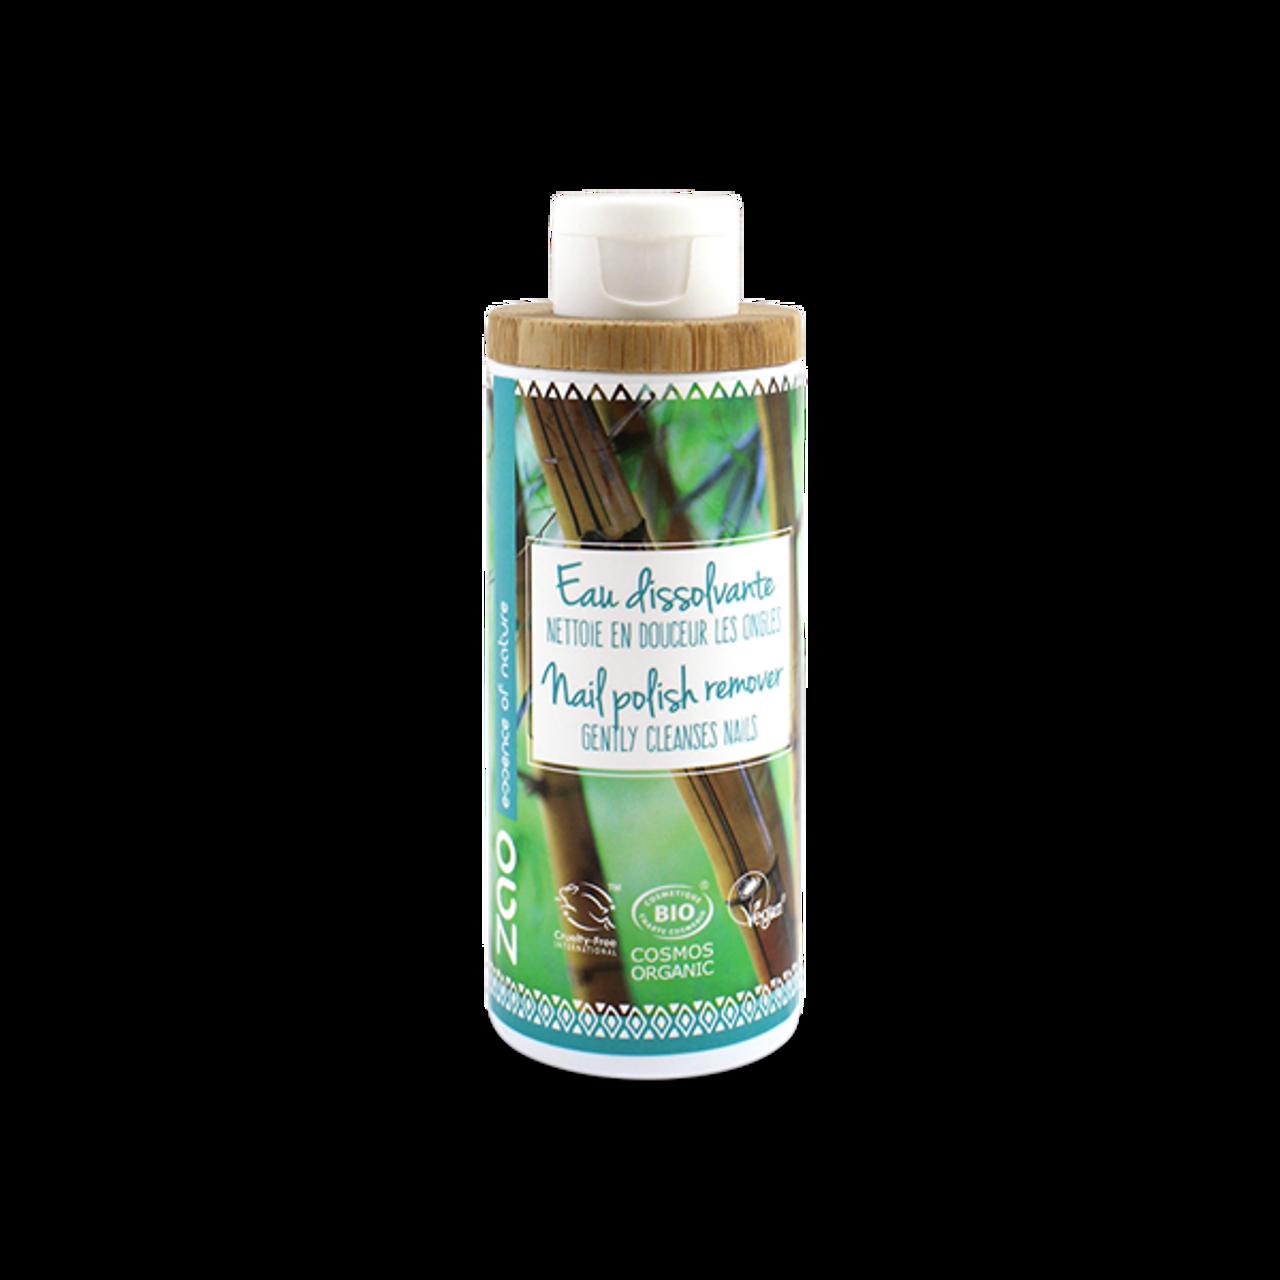 Zao Certified Organic Nail Polish Remover - beautifully organic